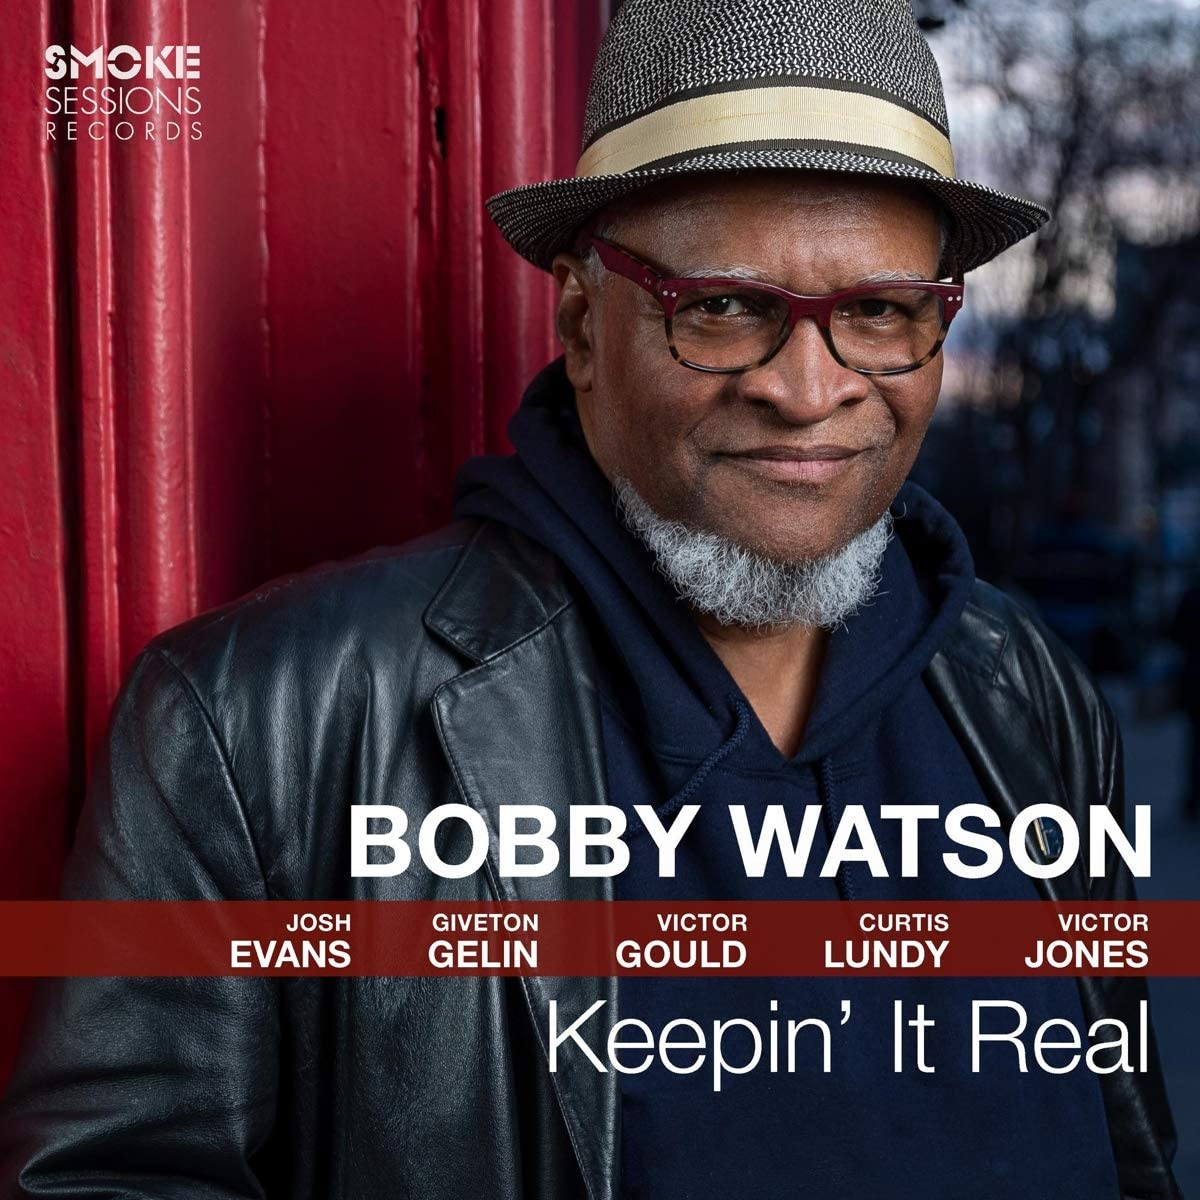 Bobby Watson - Keepin' It Real